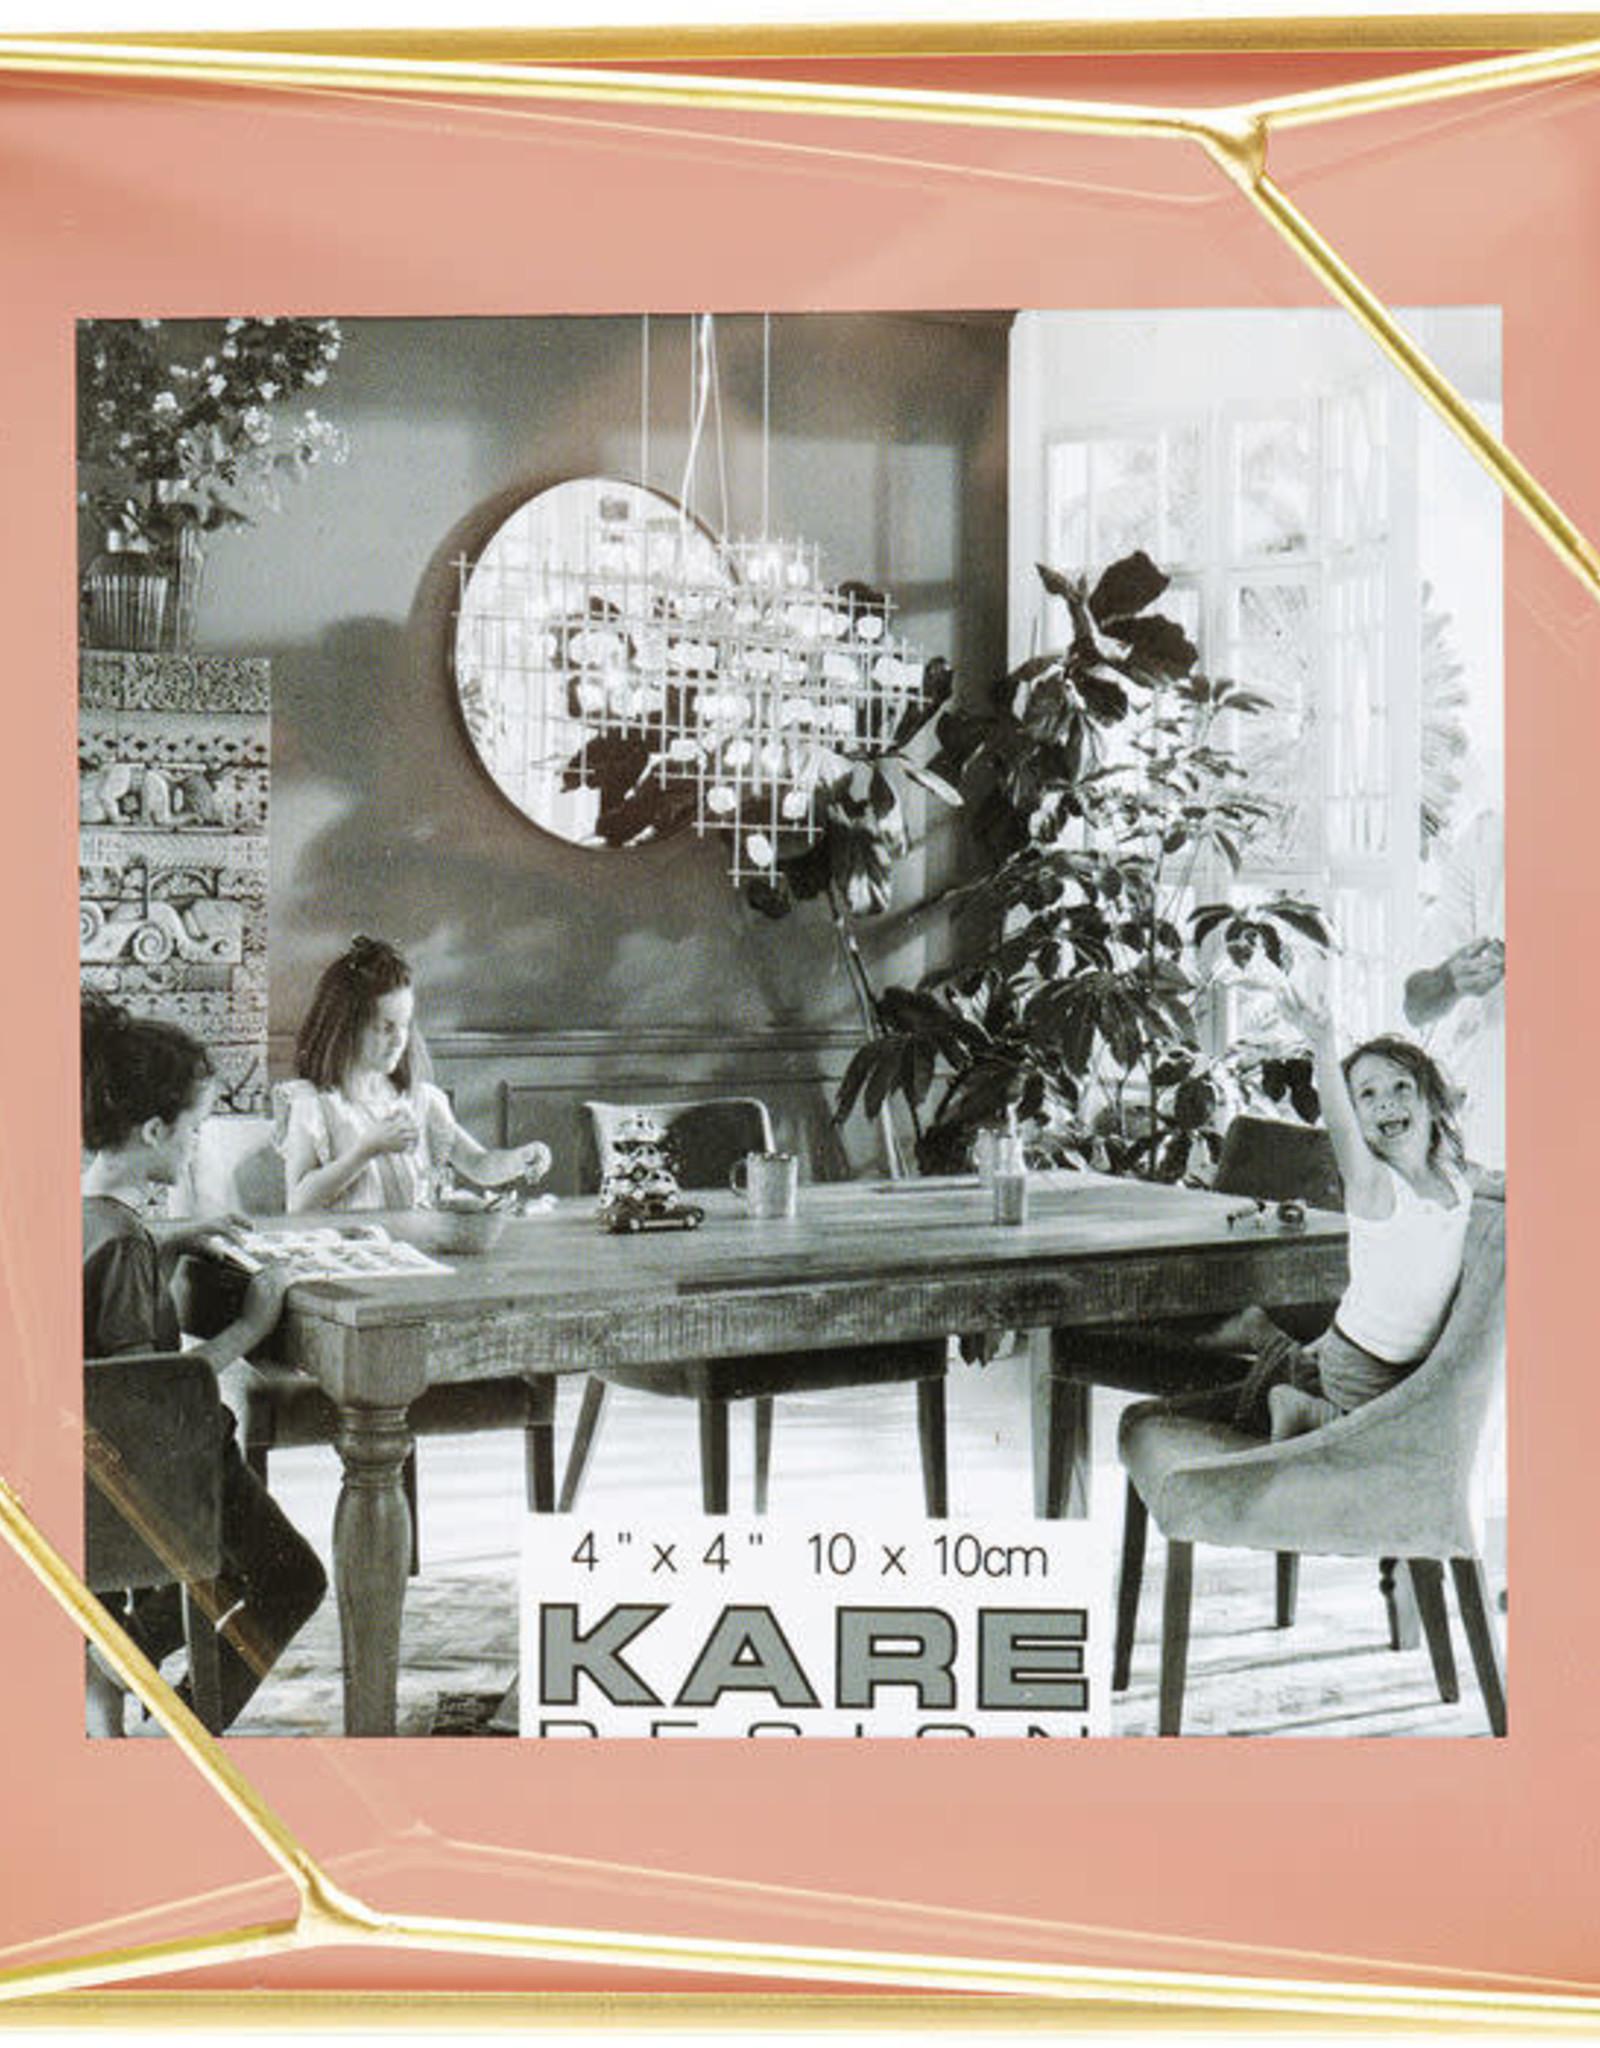 Kare Design Frame art pastel pink 10x10